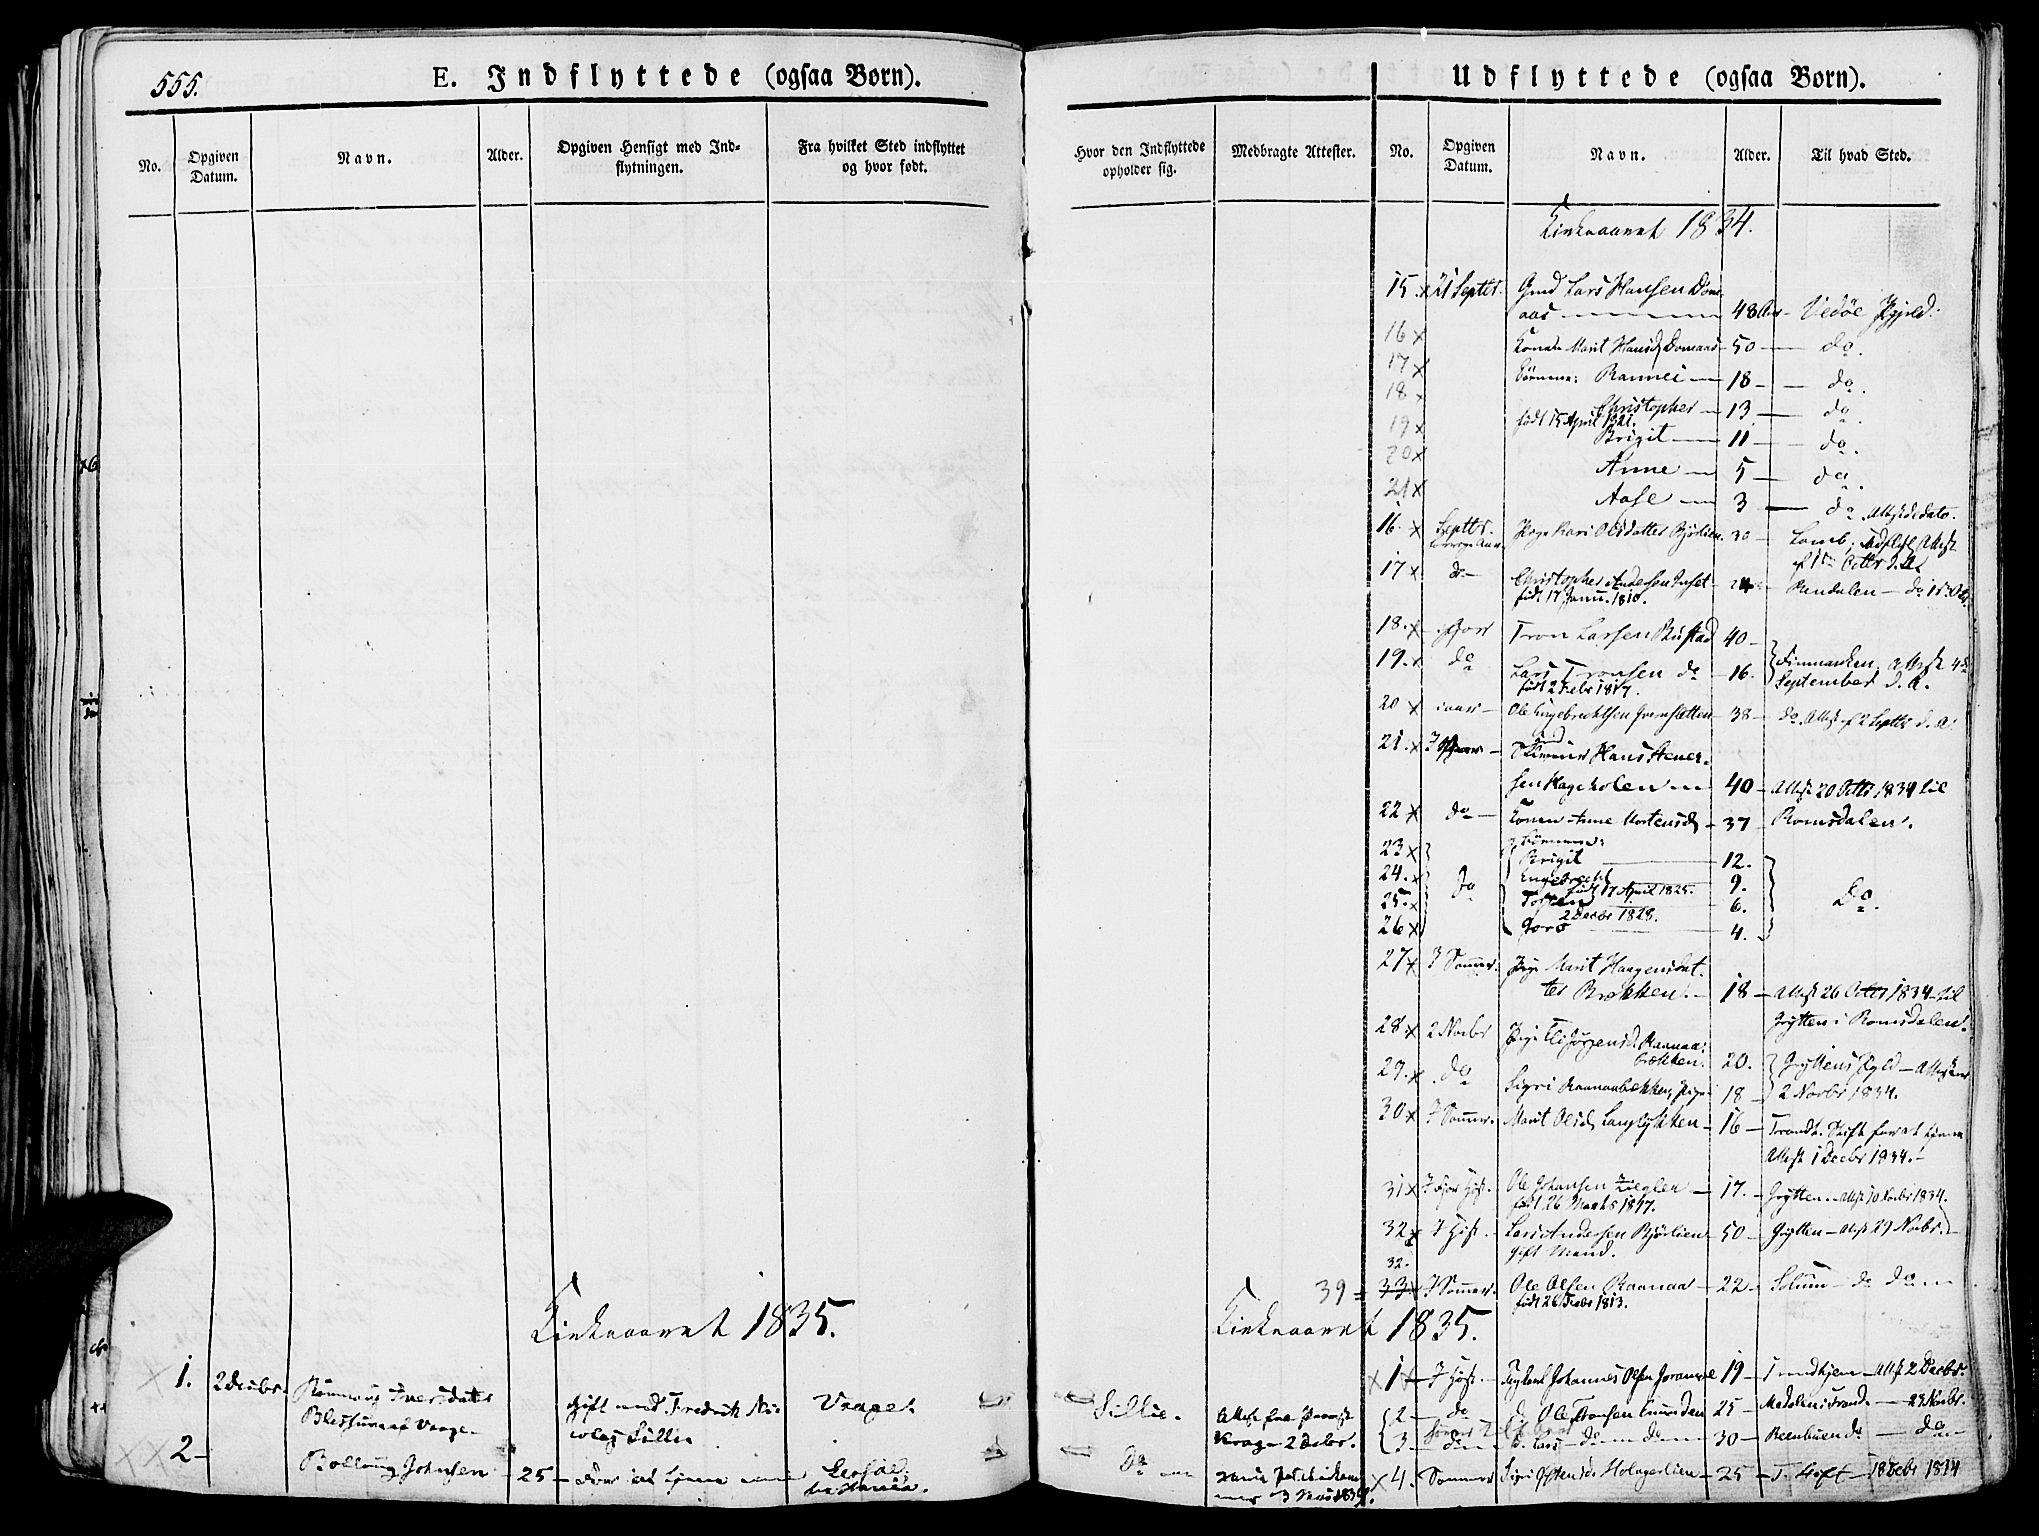 SAH, Lesja prestekontor, Ministerialbok nr. 5, 1830-1842, s. 555